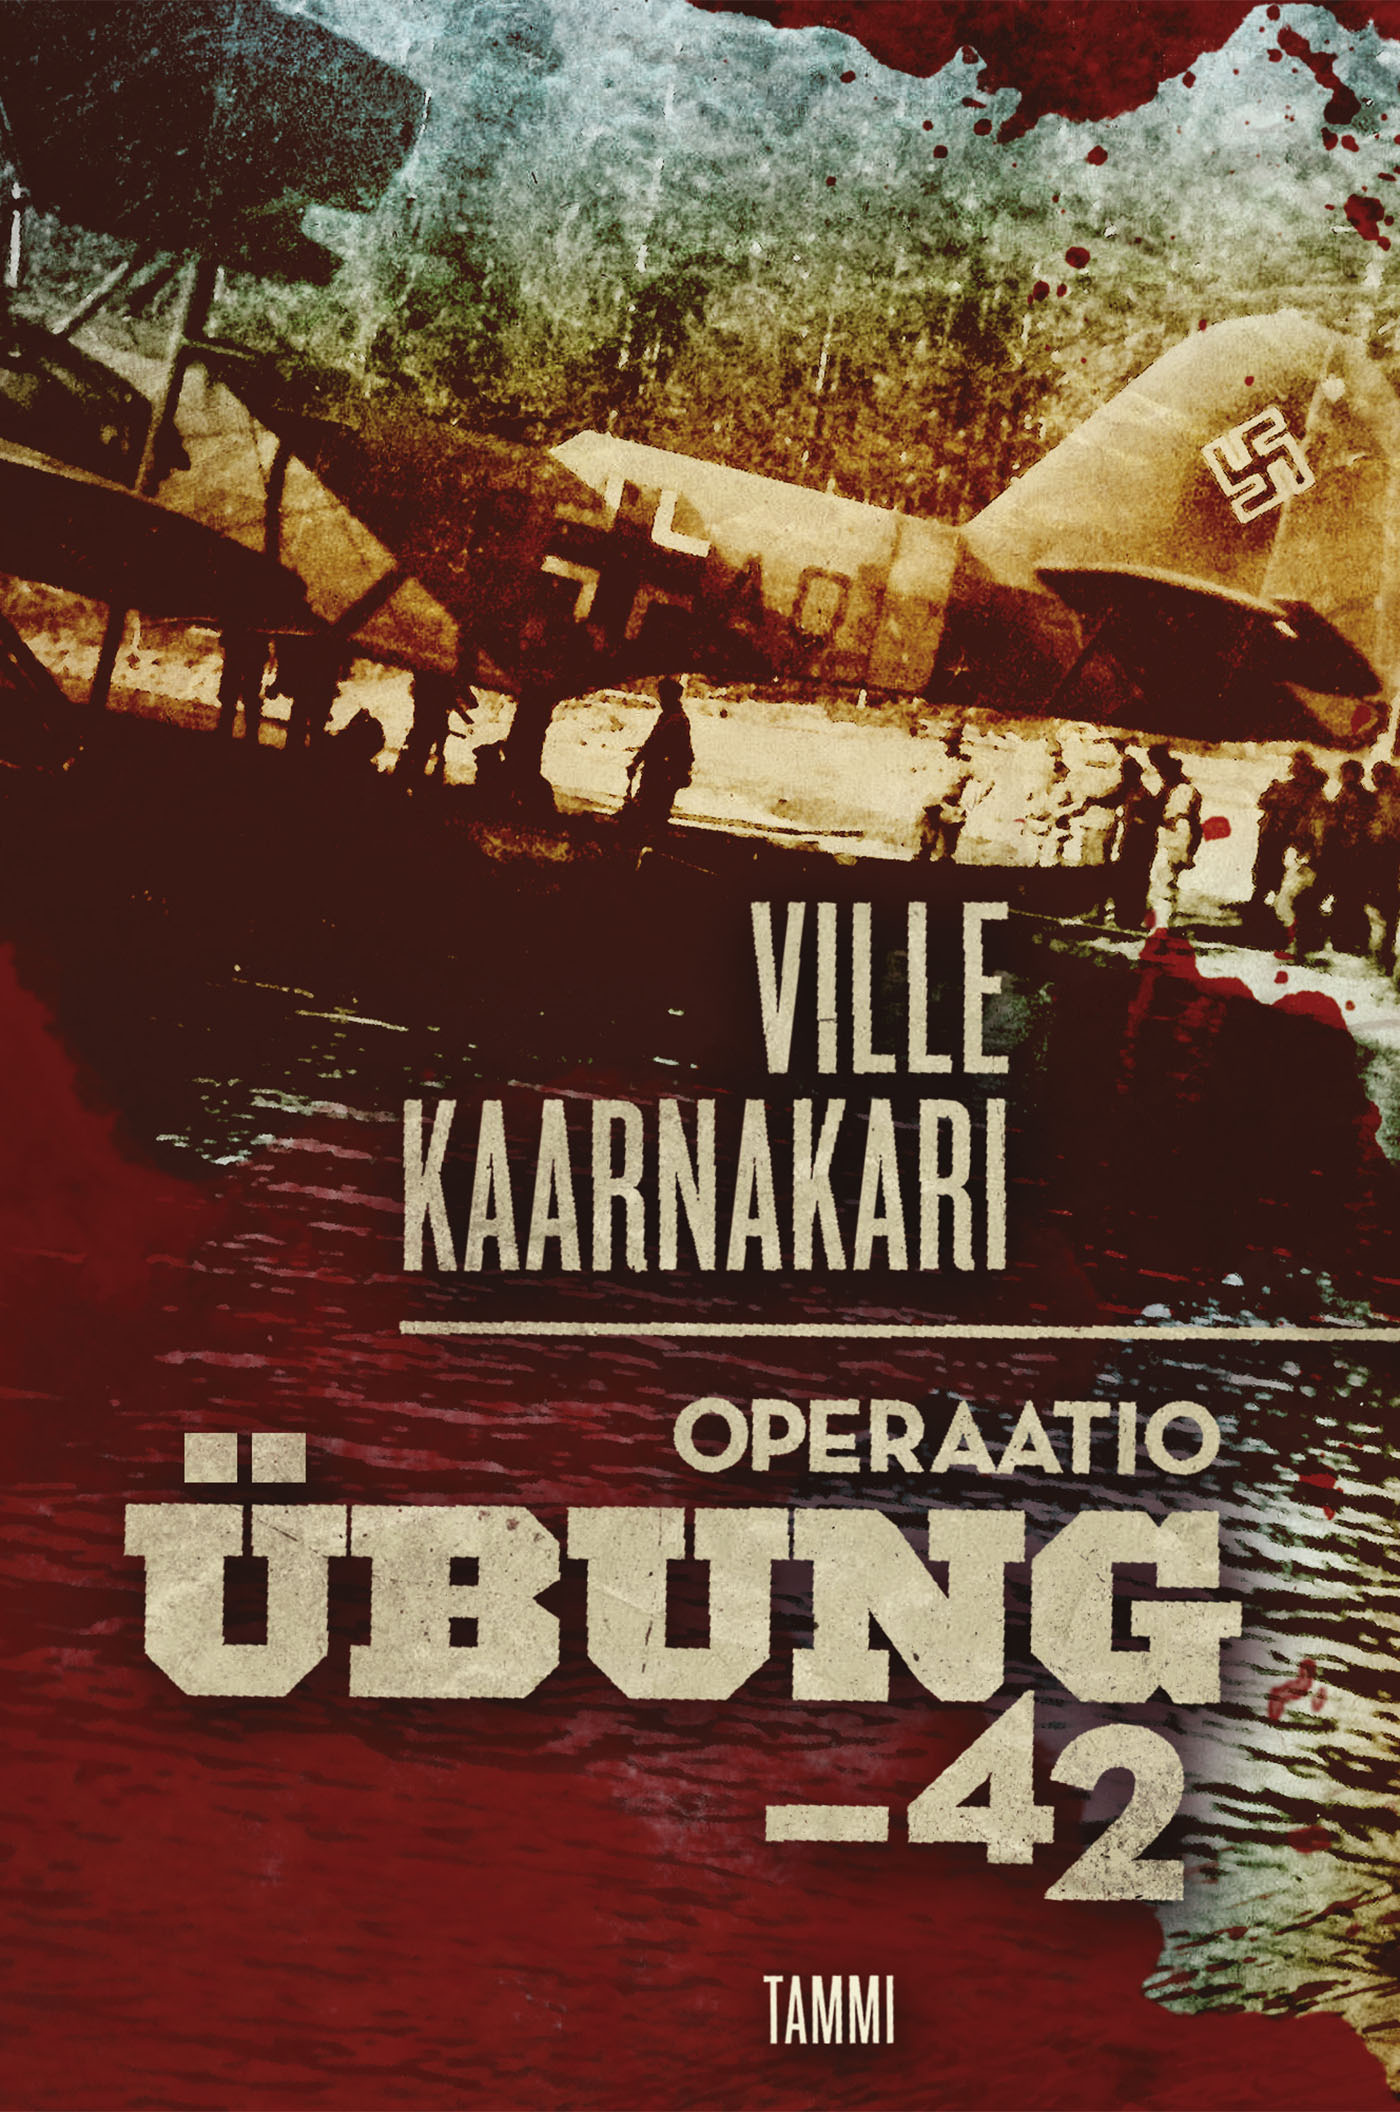 Kaarnakari, Ville - Operaatio Übung -42, ebook